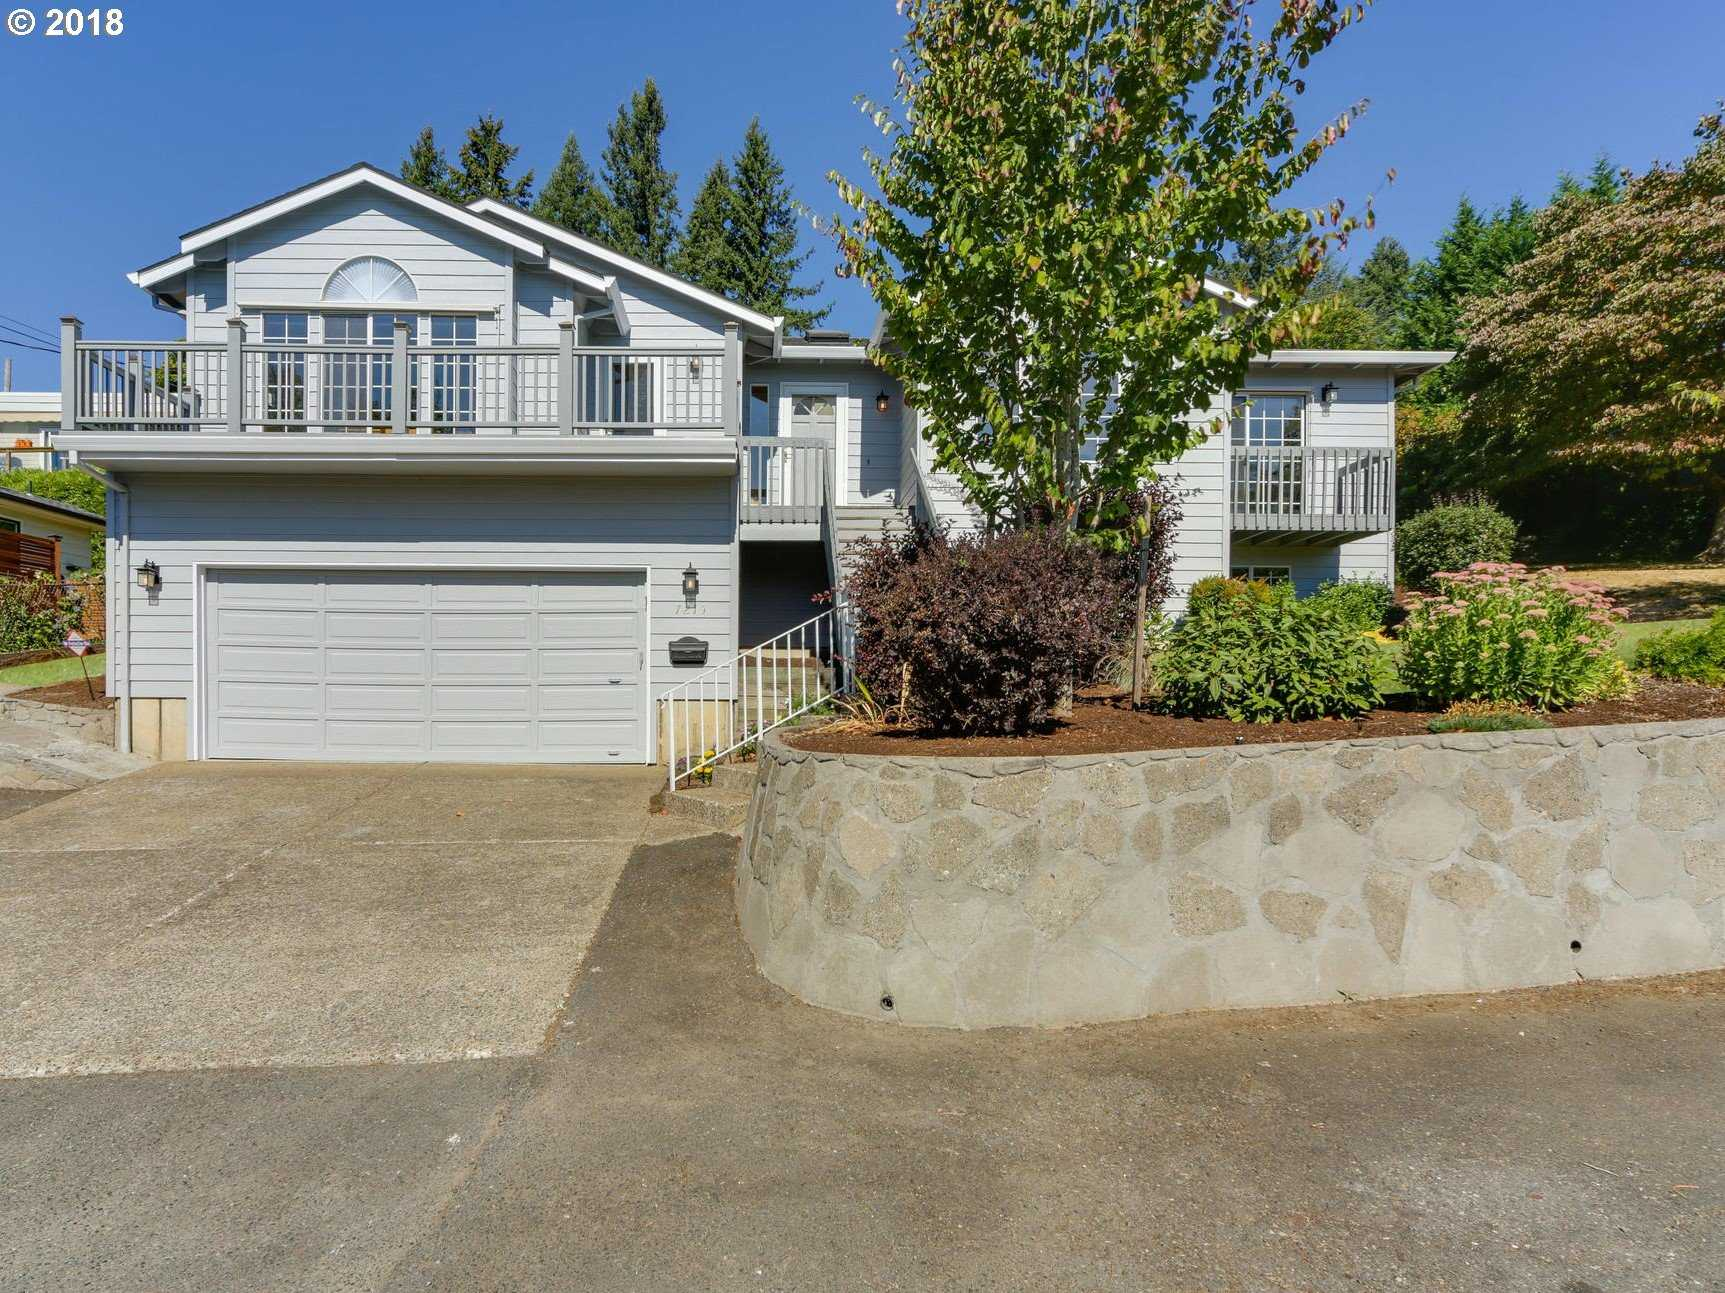 $499,000 - 4Br/3Ba -  for Sale in Hillsdale/burlingame, Portland